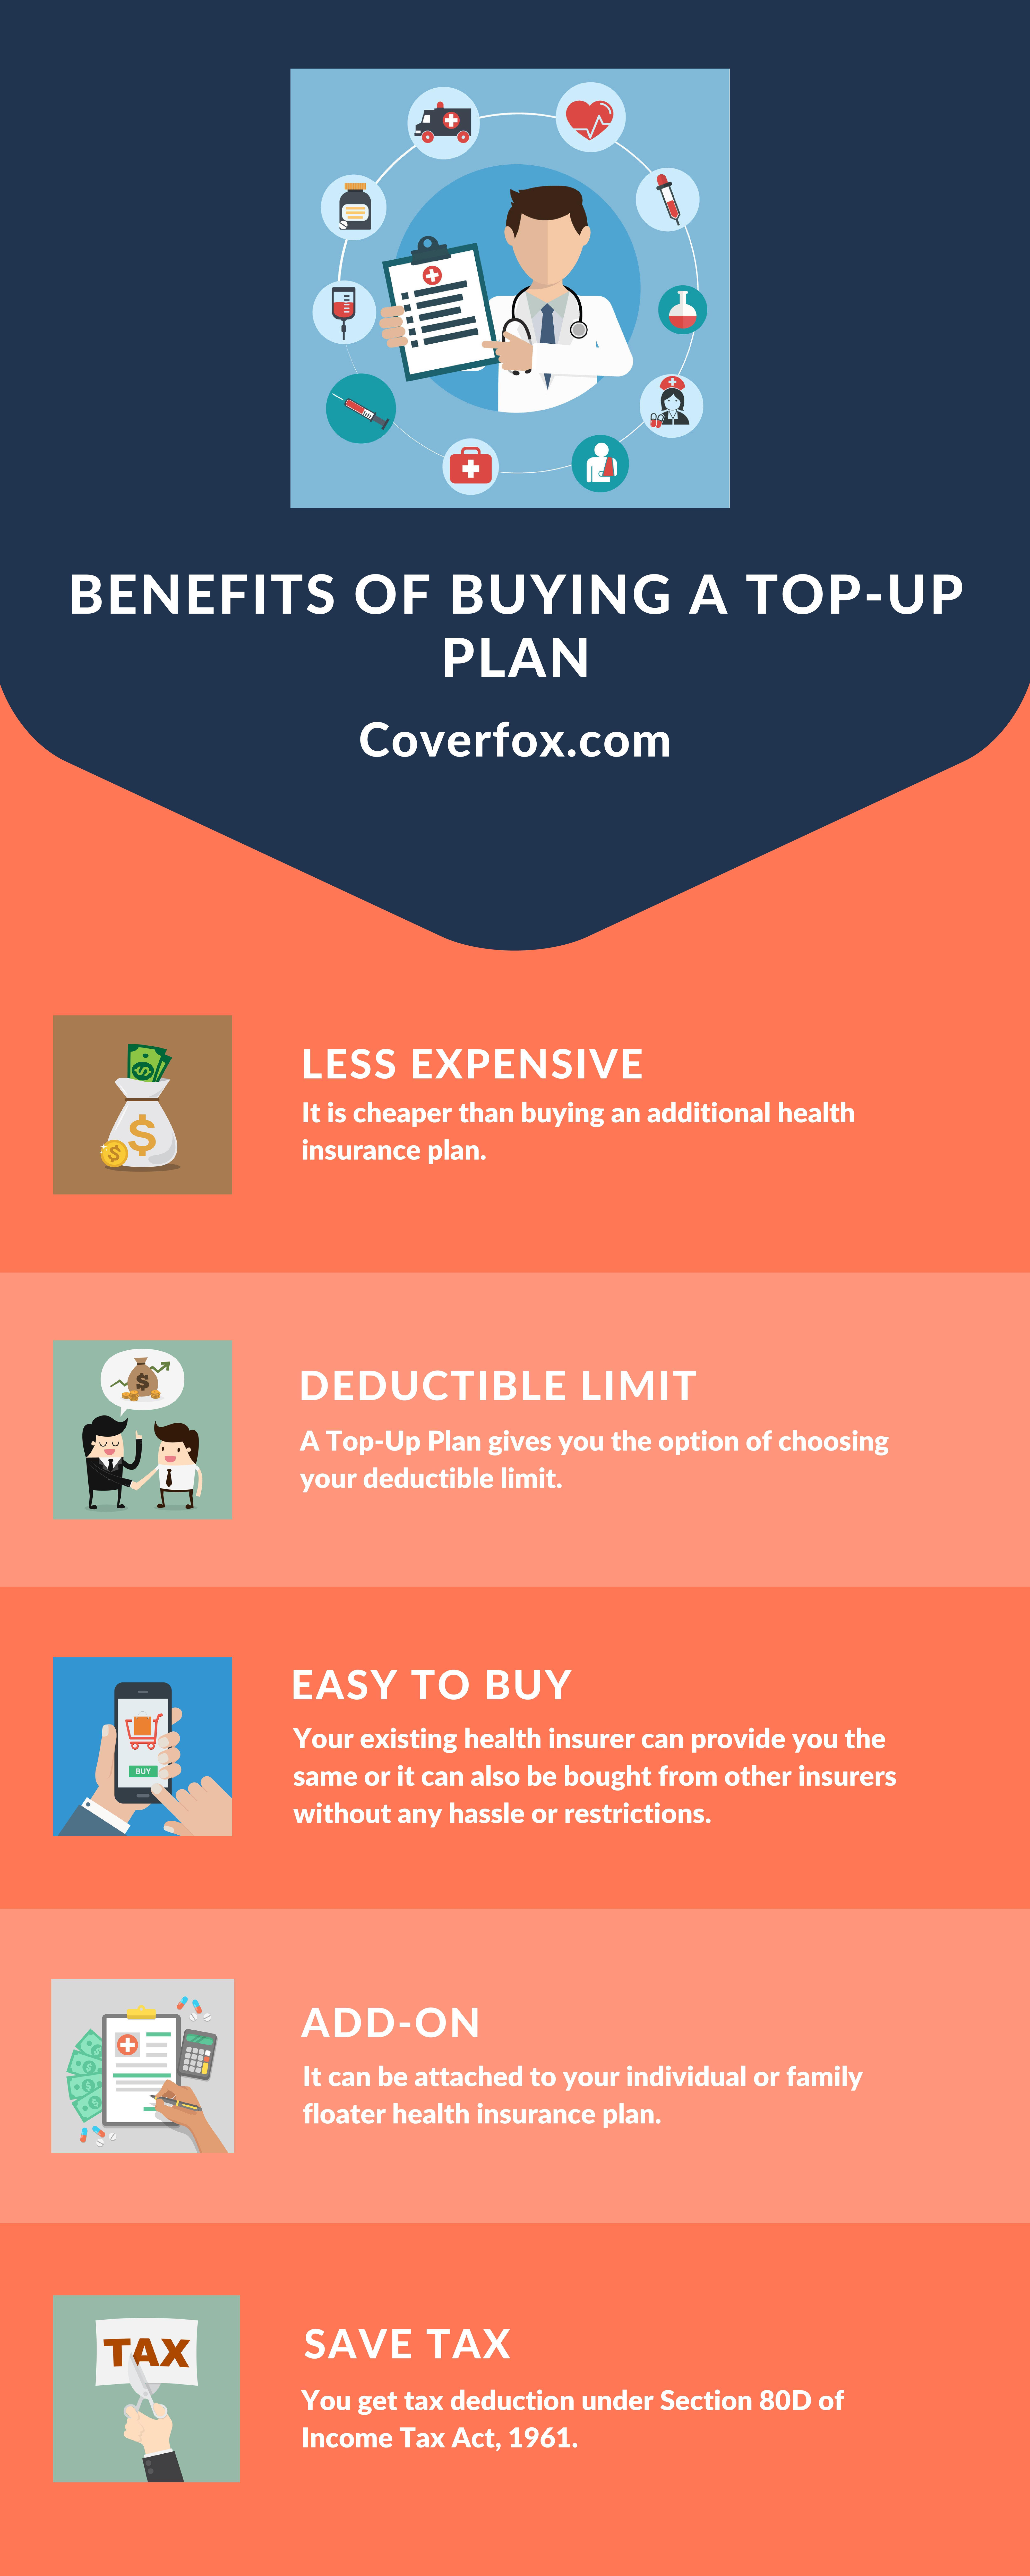 Health Top-up Plans: A Definitive Guide | Coverfox.com